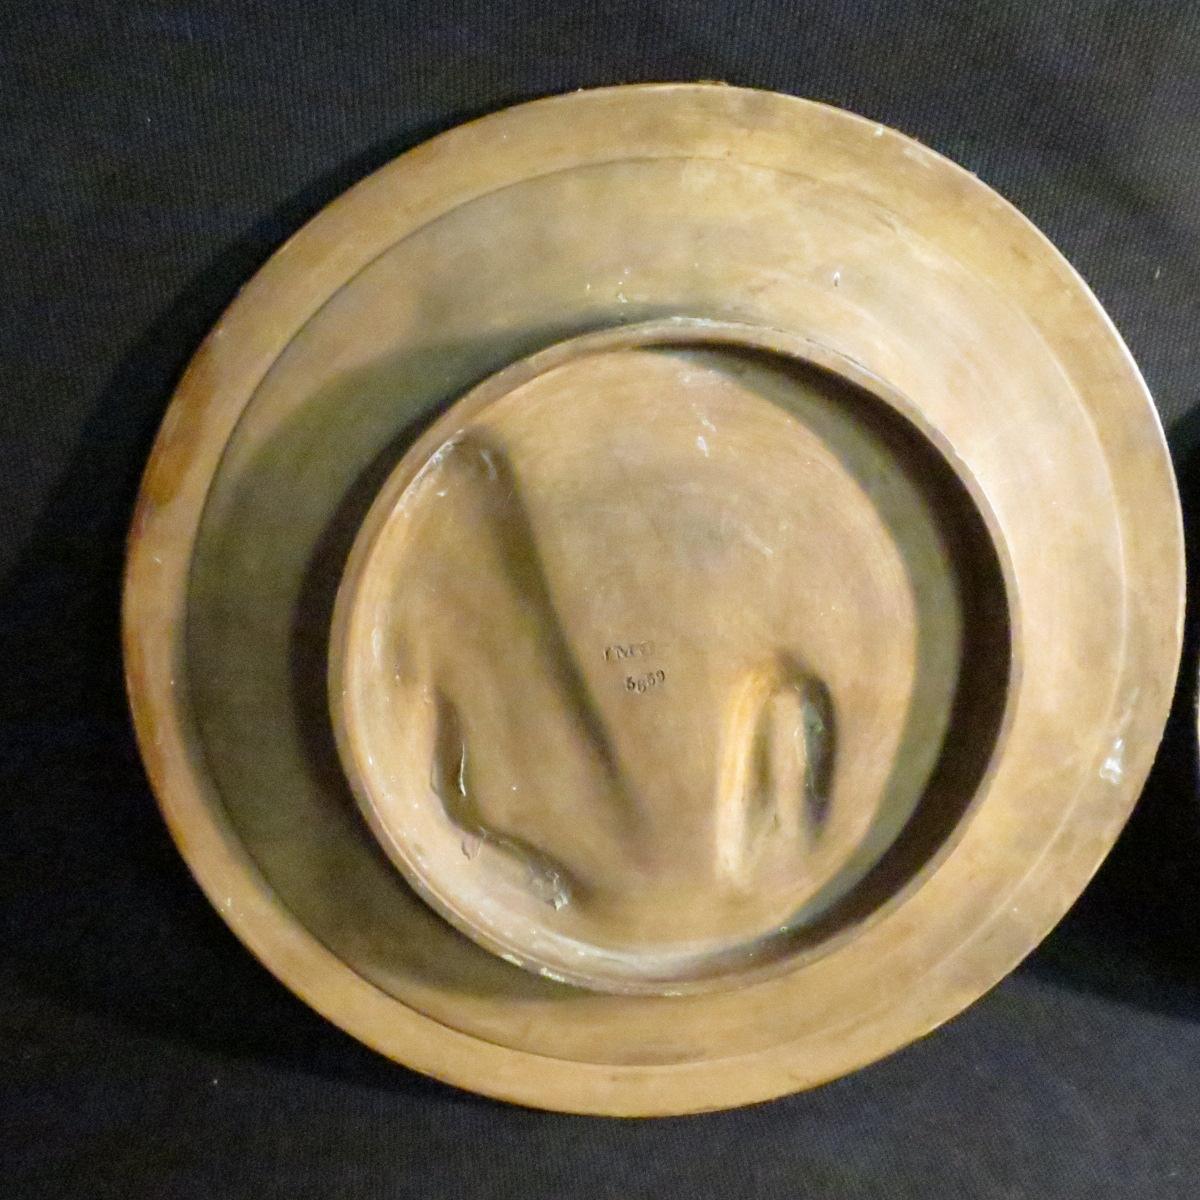 Johann Maresch Pair Of Plates Plates Pottery Central European Gypsies-photo-8